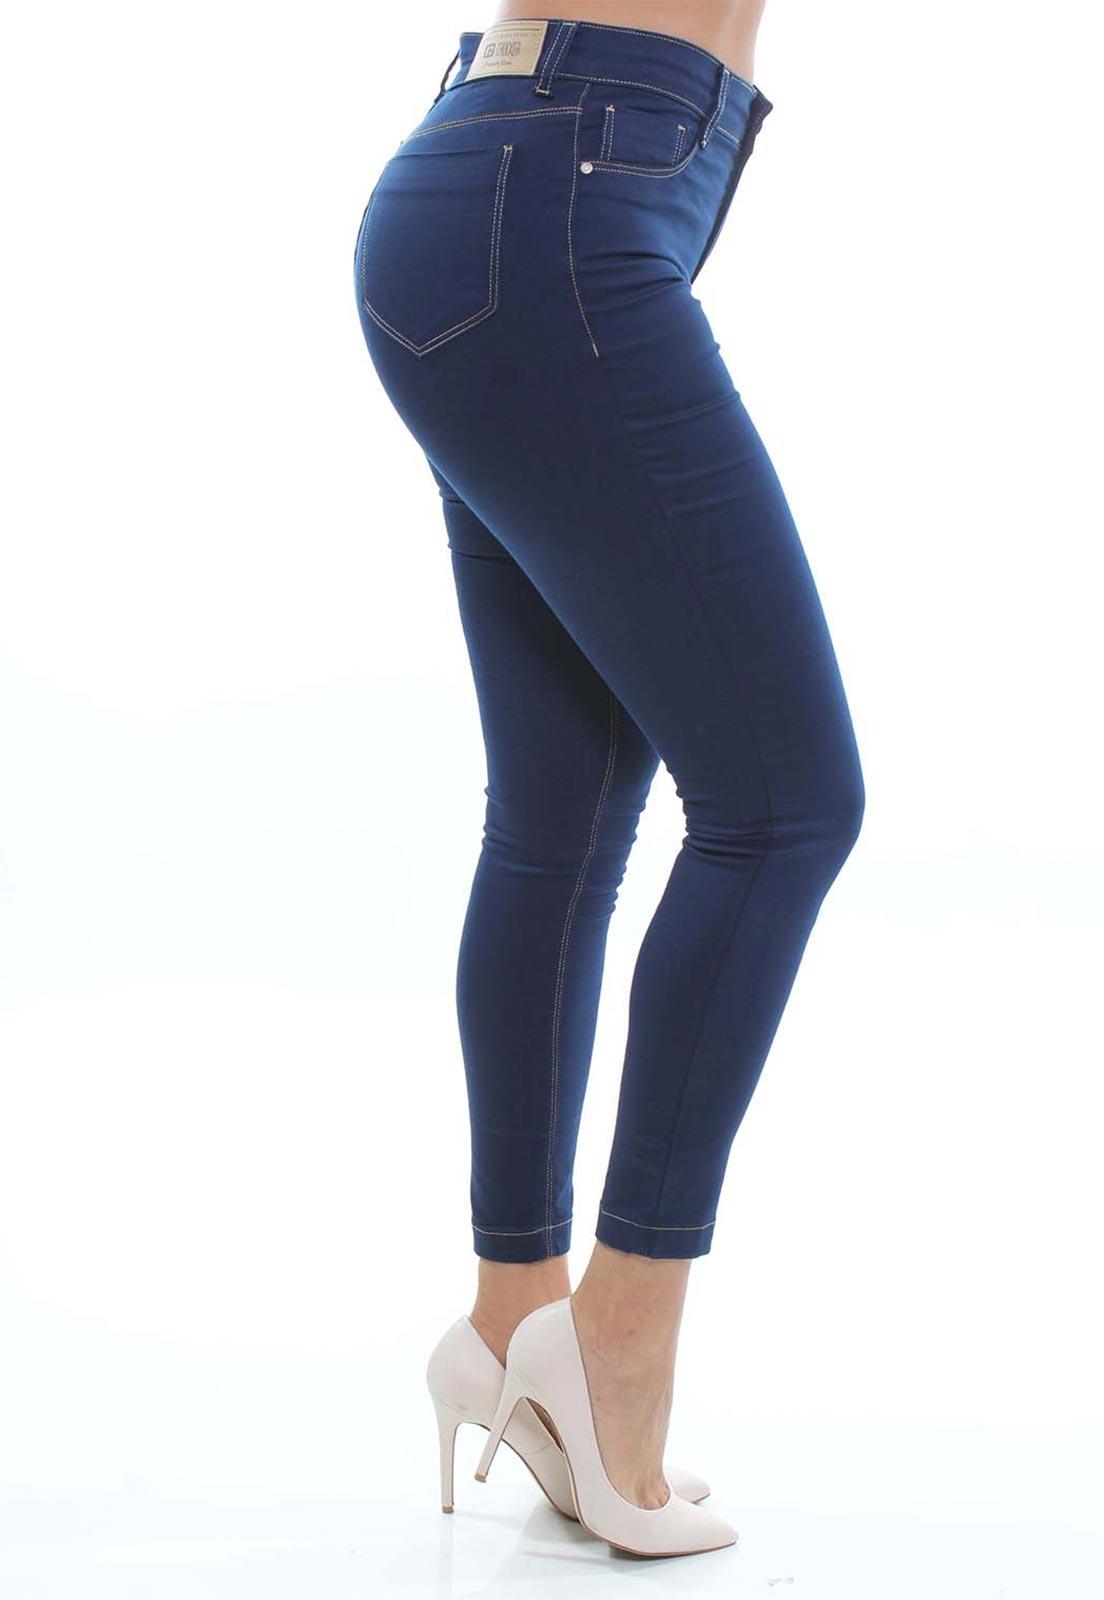 Calça Jeans Feminina Crocker - 48041  - CROCKER JEANS